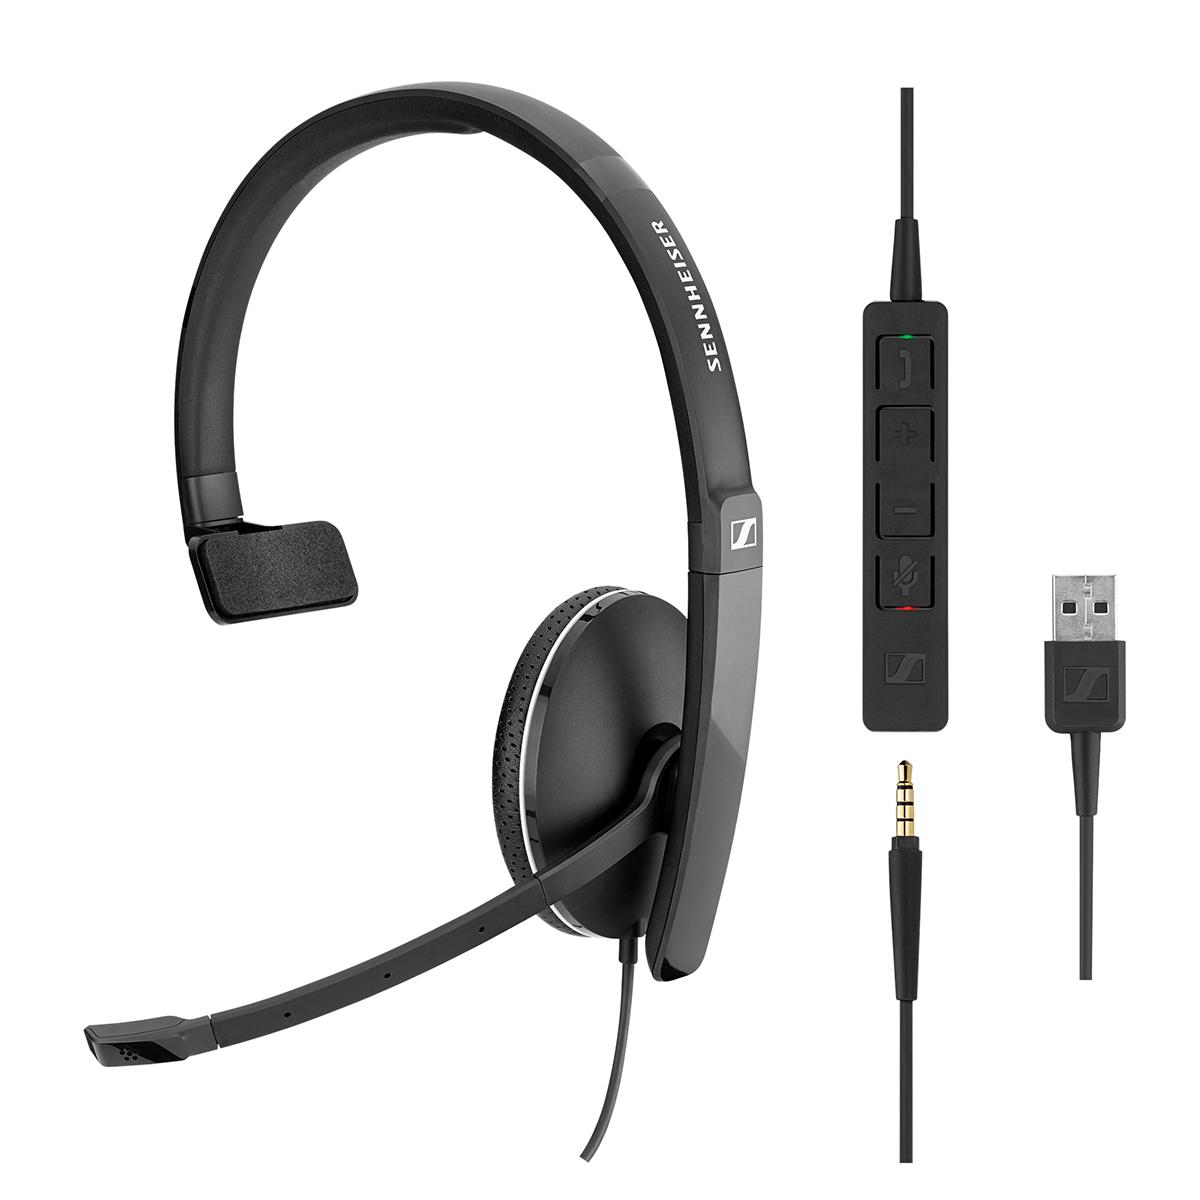 EPOS Sennheiser SC135 USB Mono Headset